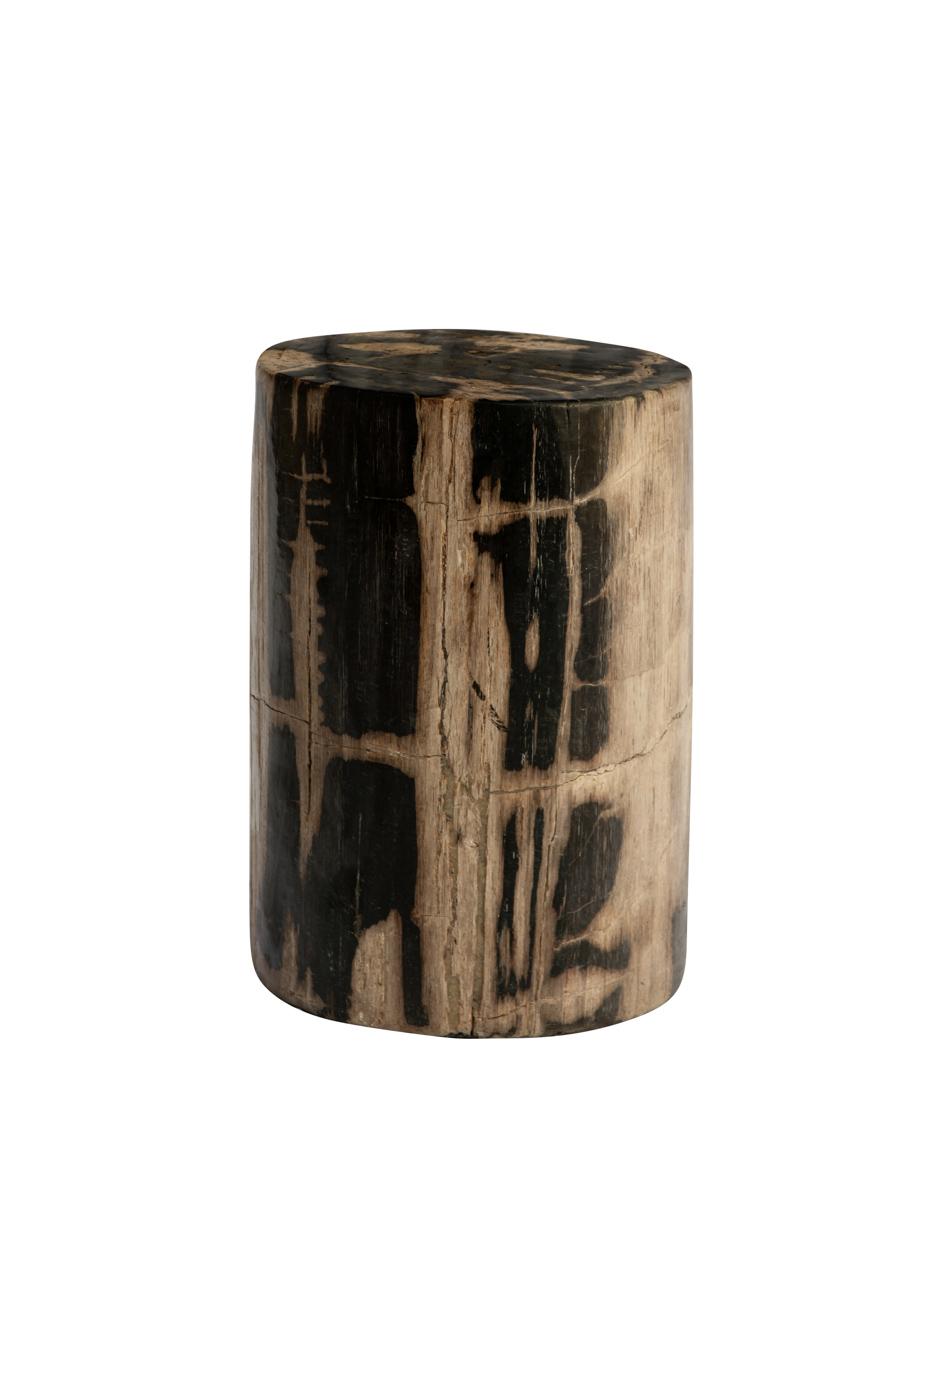 Tronco de madera fosilizada natural-negro